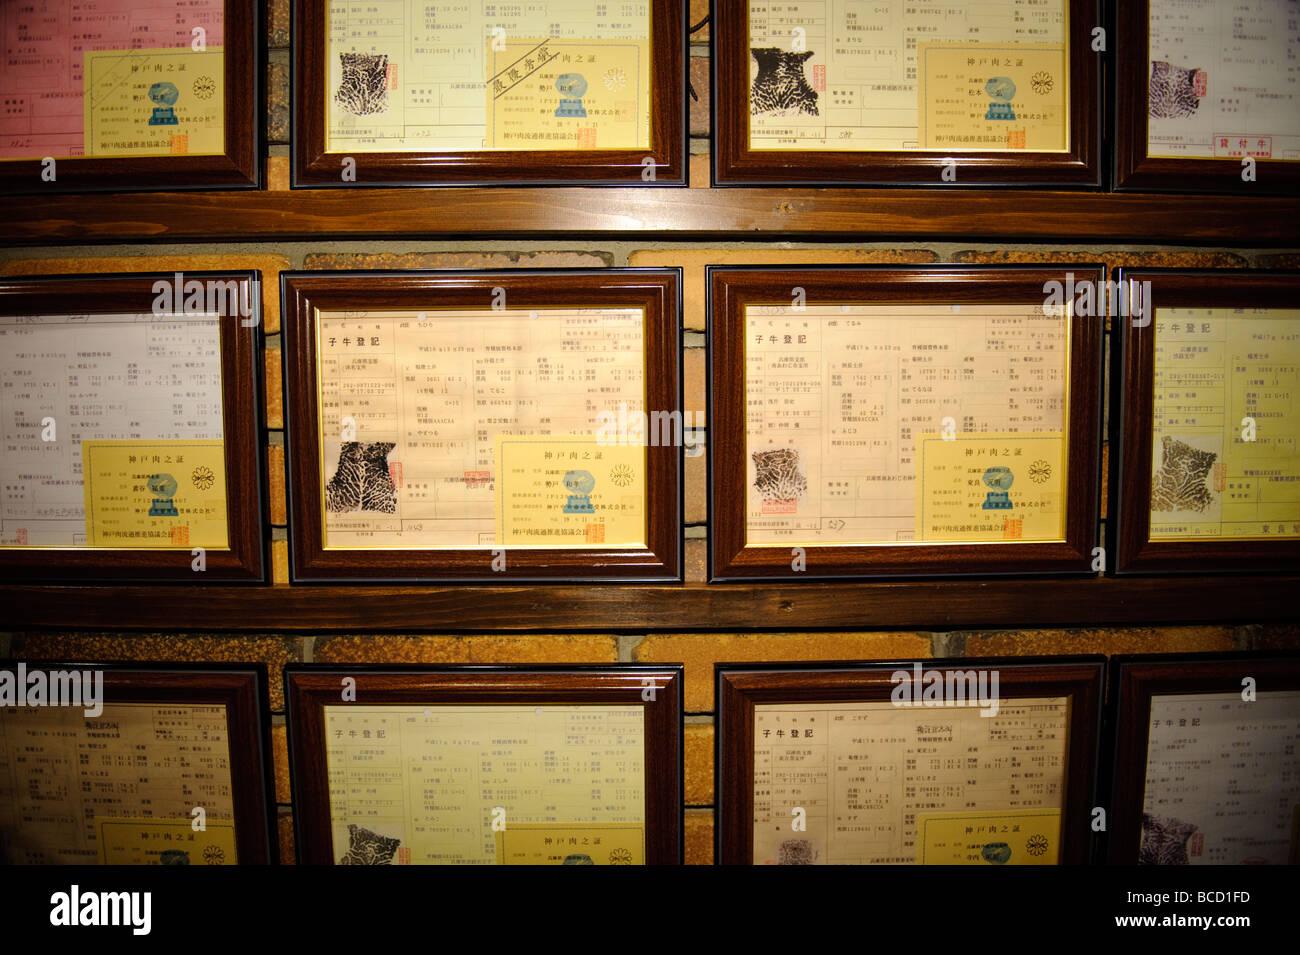 Kobe beef certificates at Kobe Beef Bifteck Kawamura restaurant, Kobe city Hyogo Prefecture Japan, June 25 2009. Stock Photo